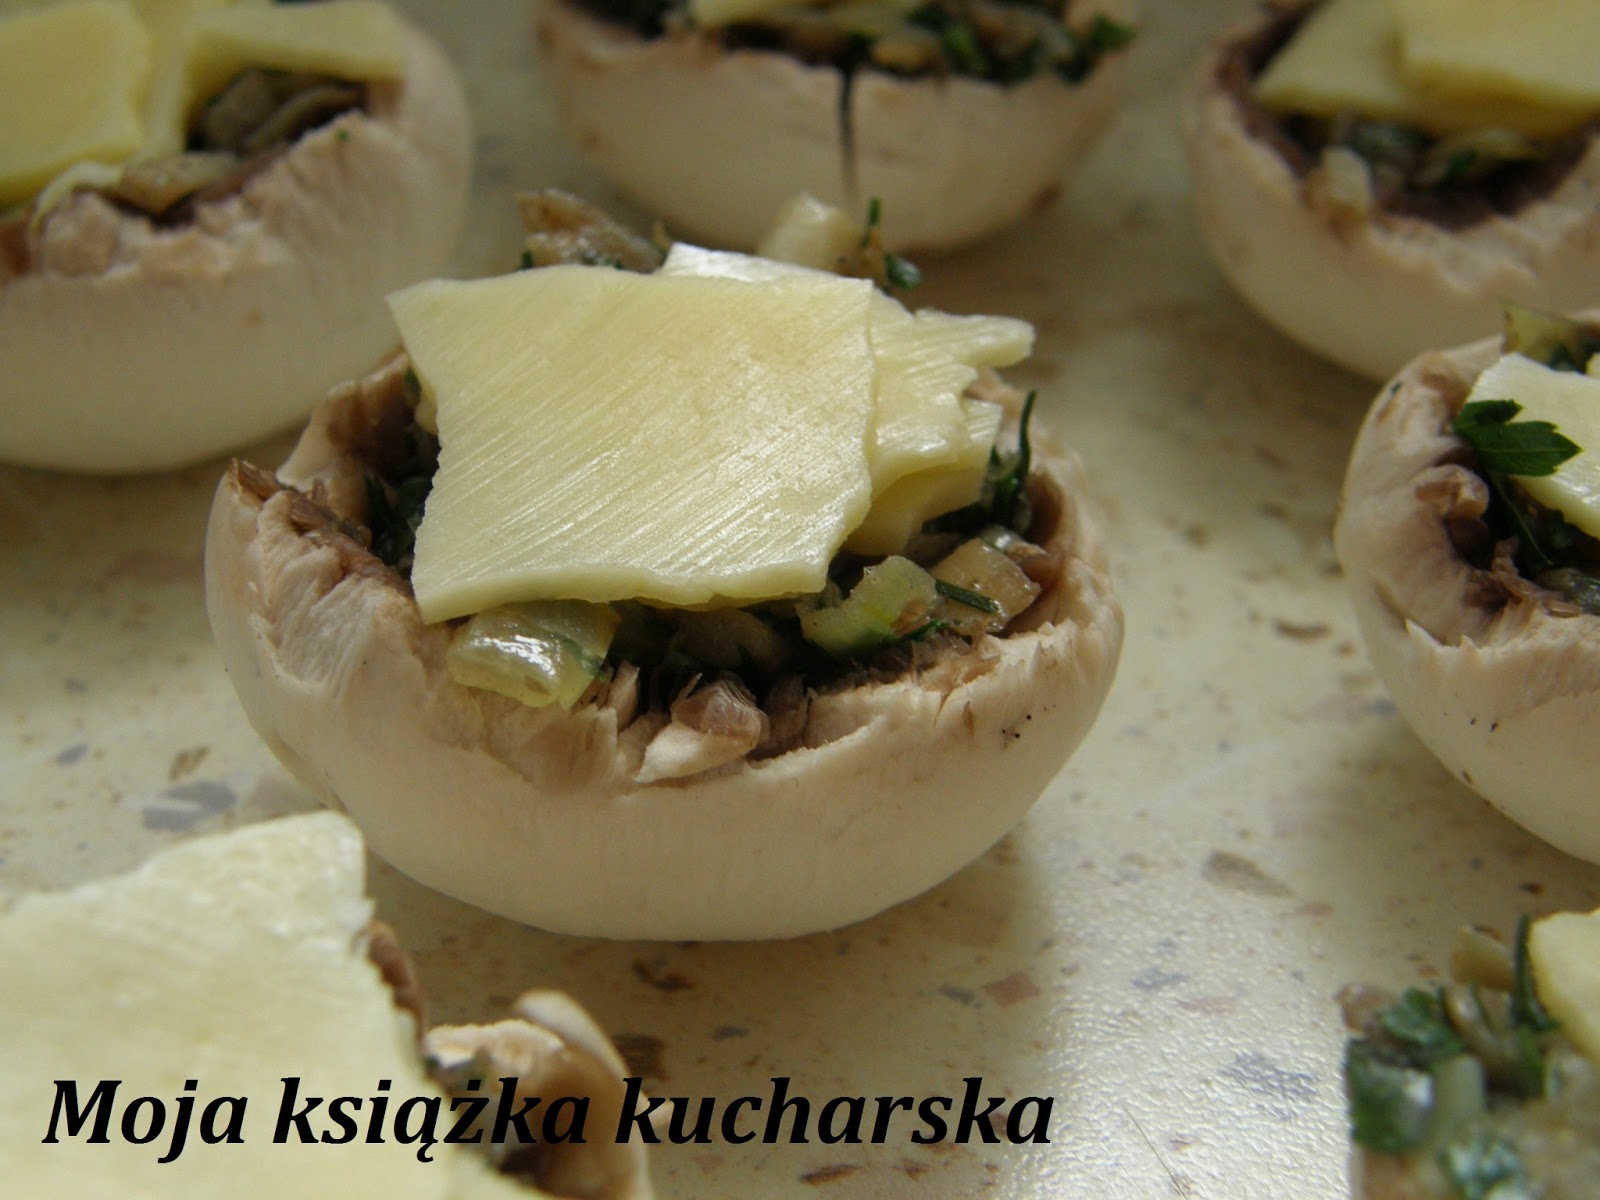 faszerowane pieczarki - Żródło http://moja-ksiazka-kucharska.blogspot.com